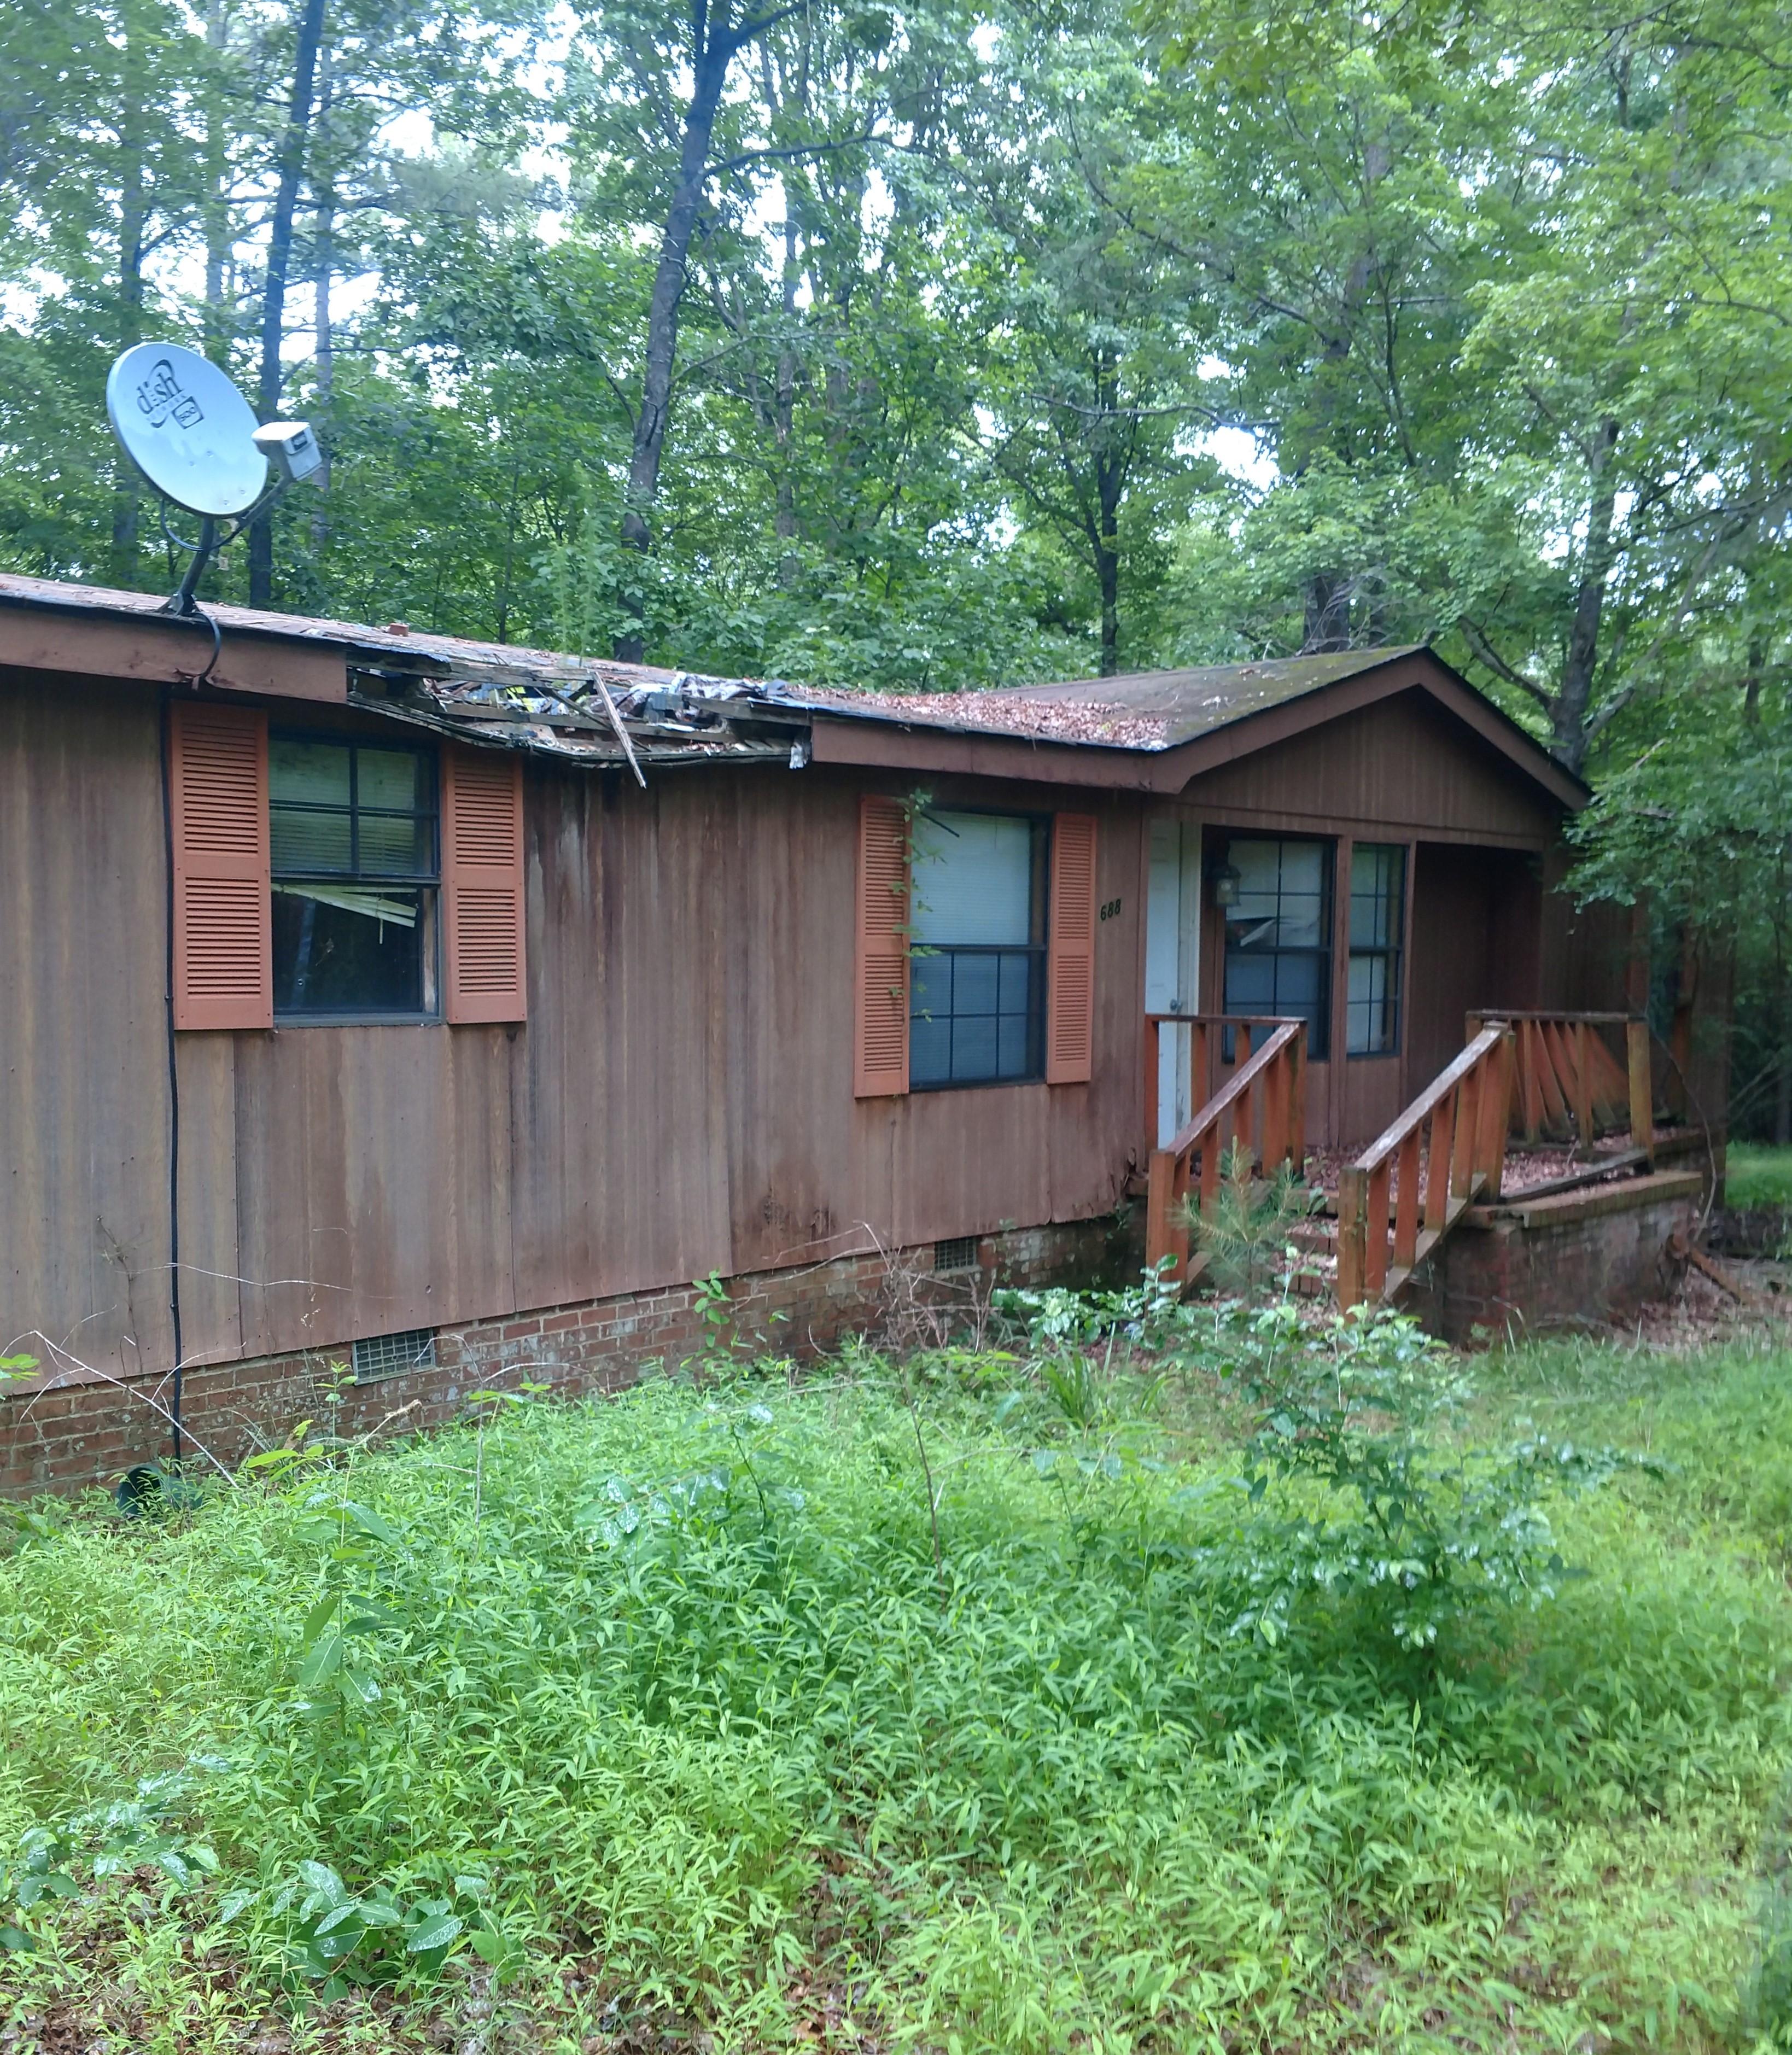 688 Soloman Degraffenreidt Rd, Pittsboro, NC